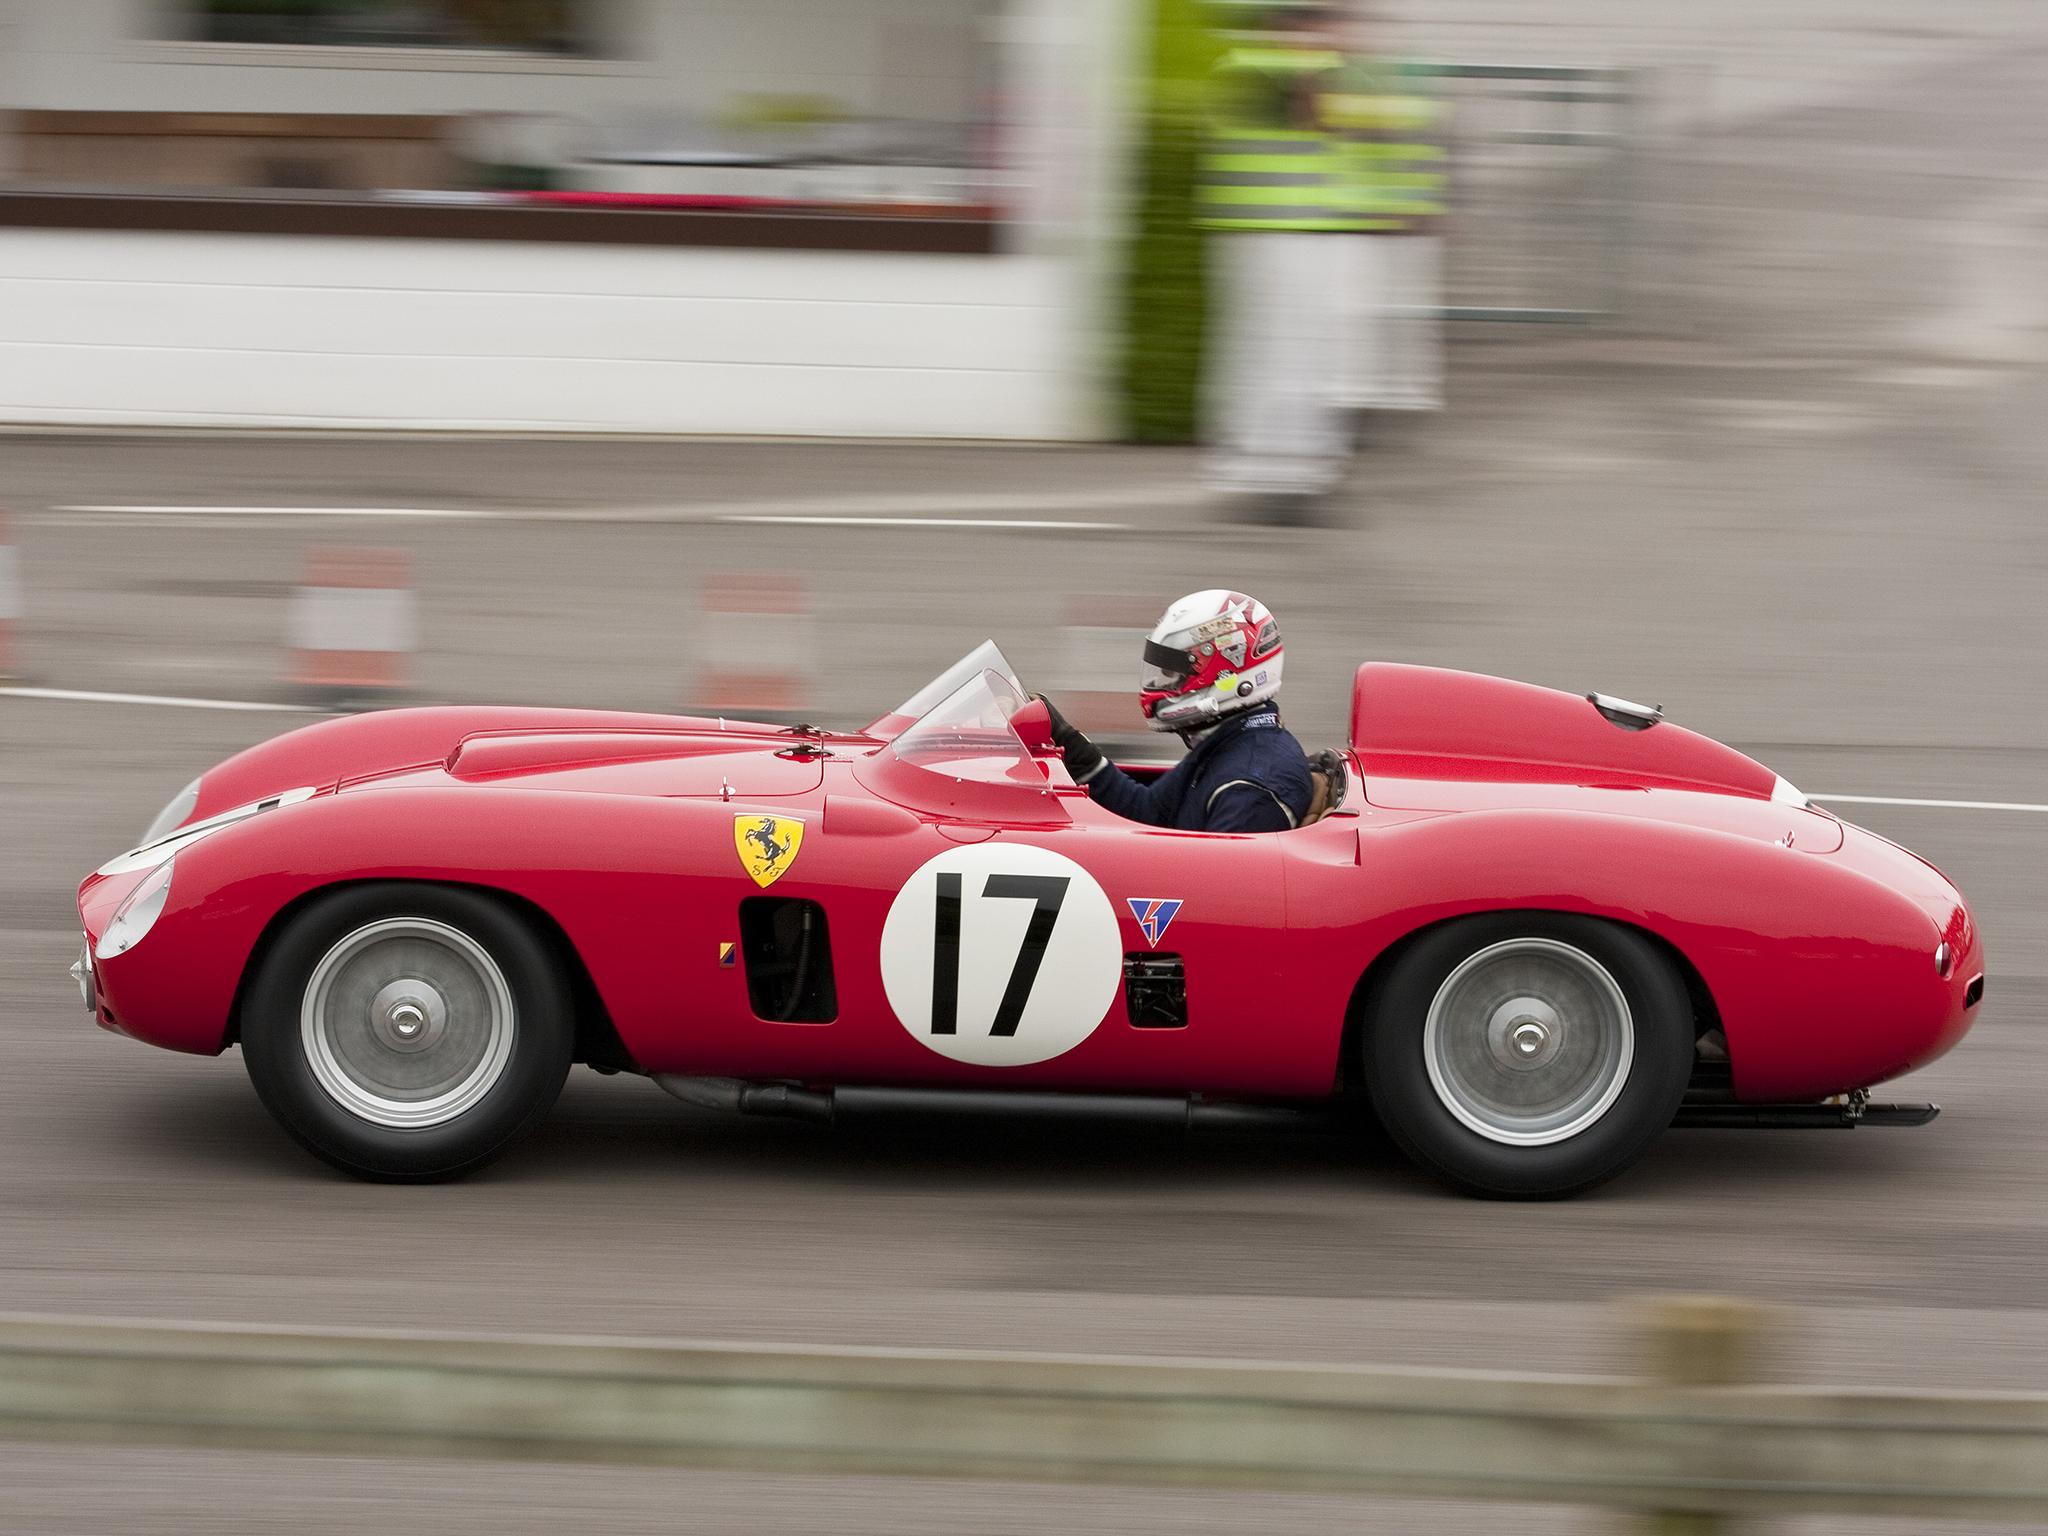 1956 Ferrari 860 Monza Race Racing Supercar Retro G